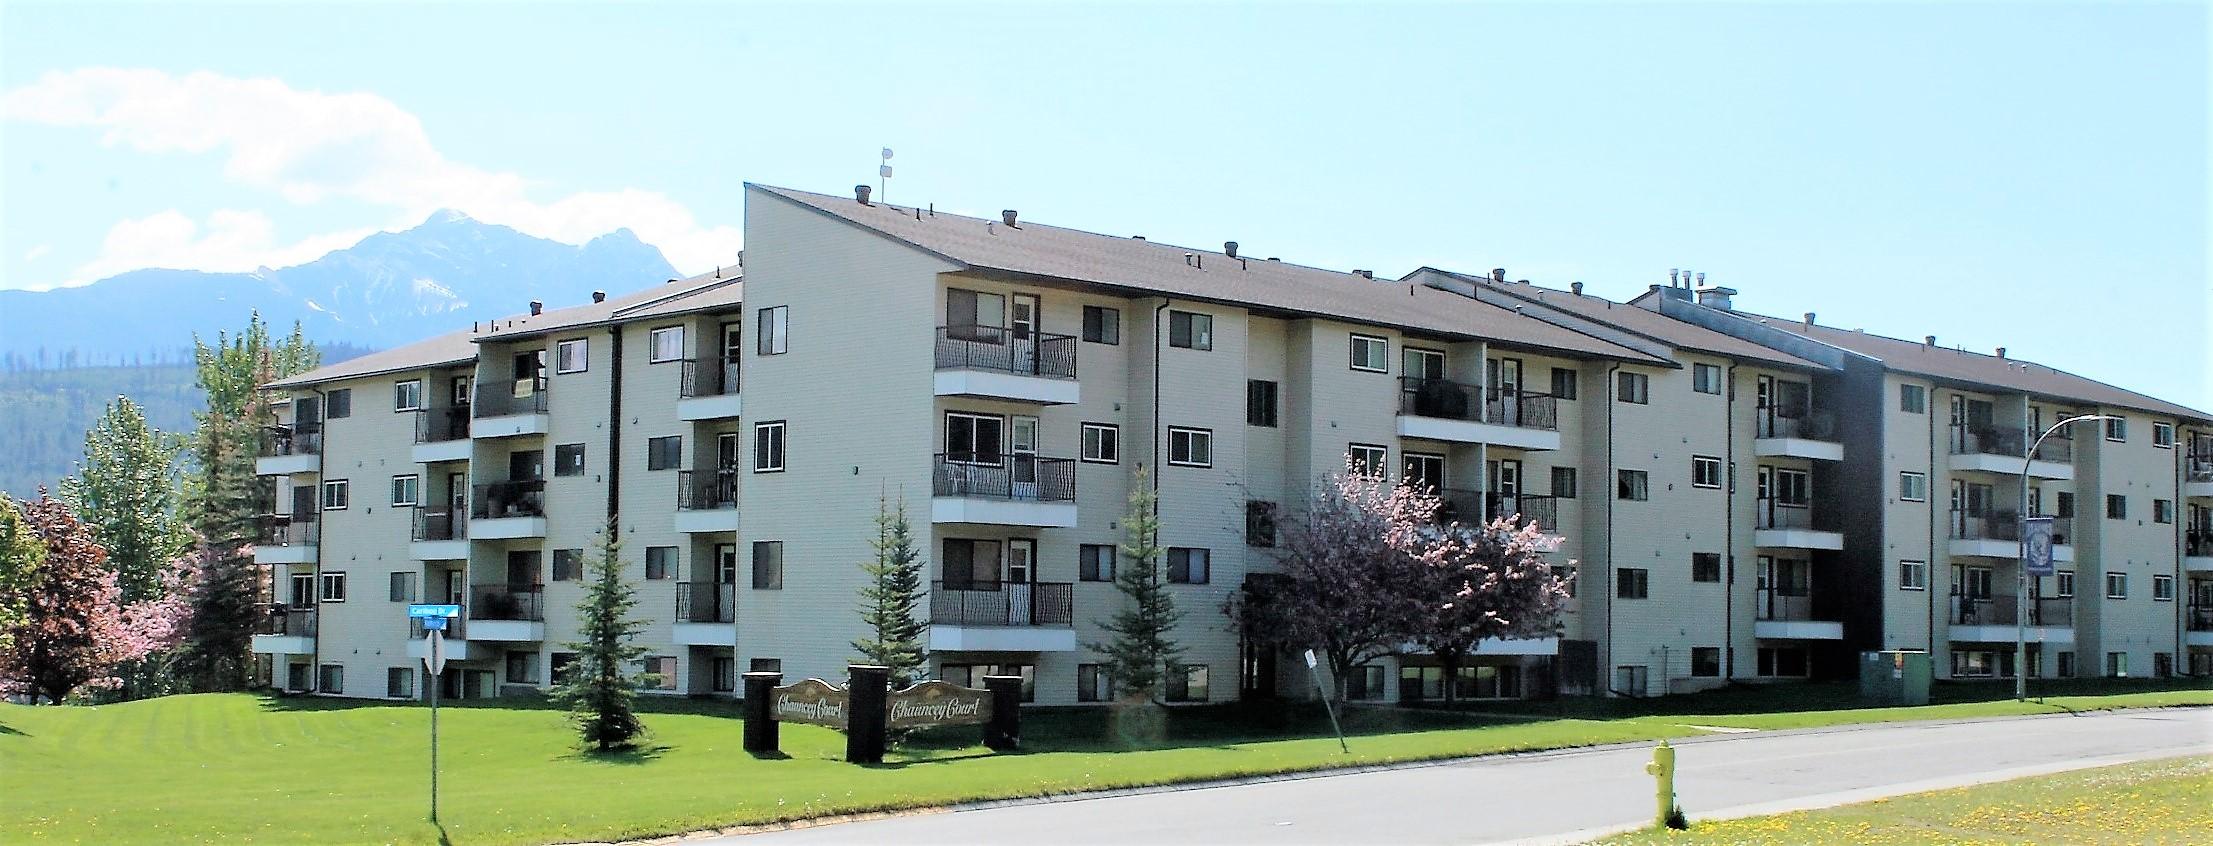 301 10 Cariboo Drive